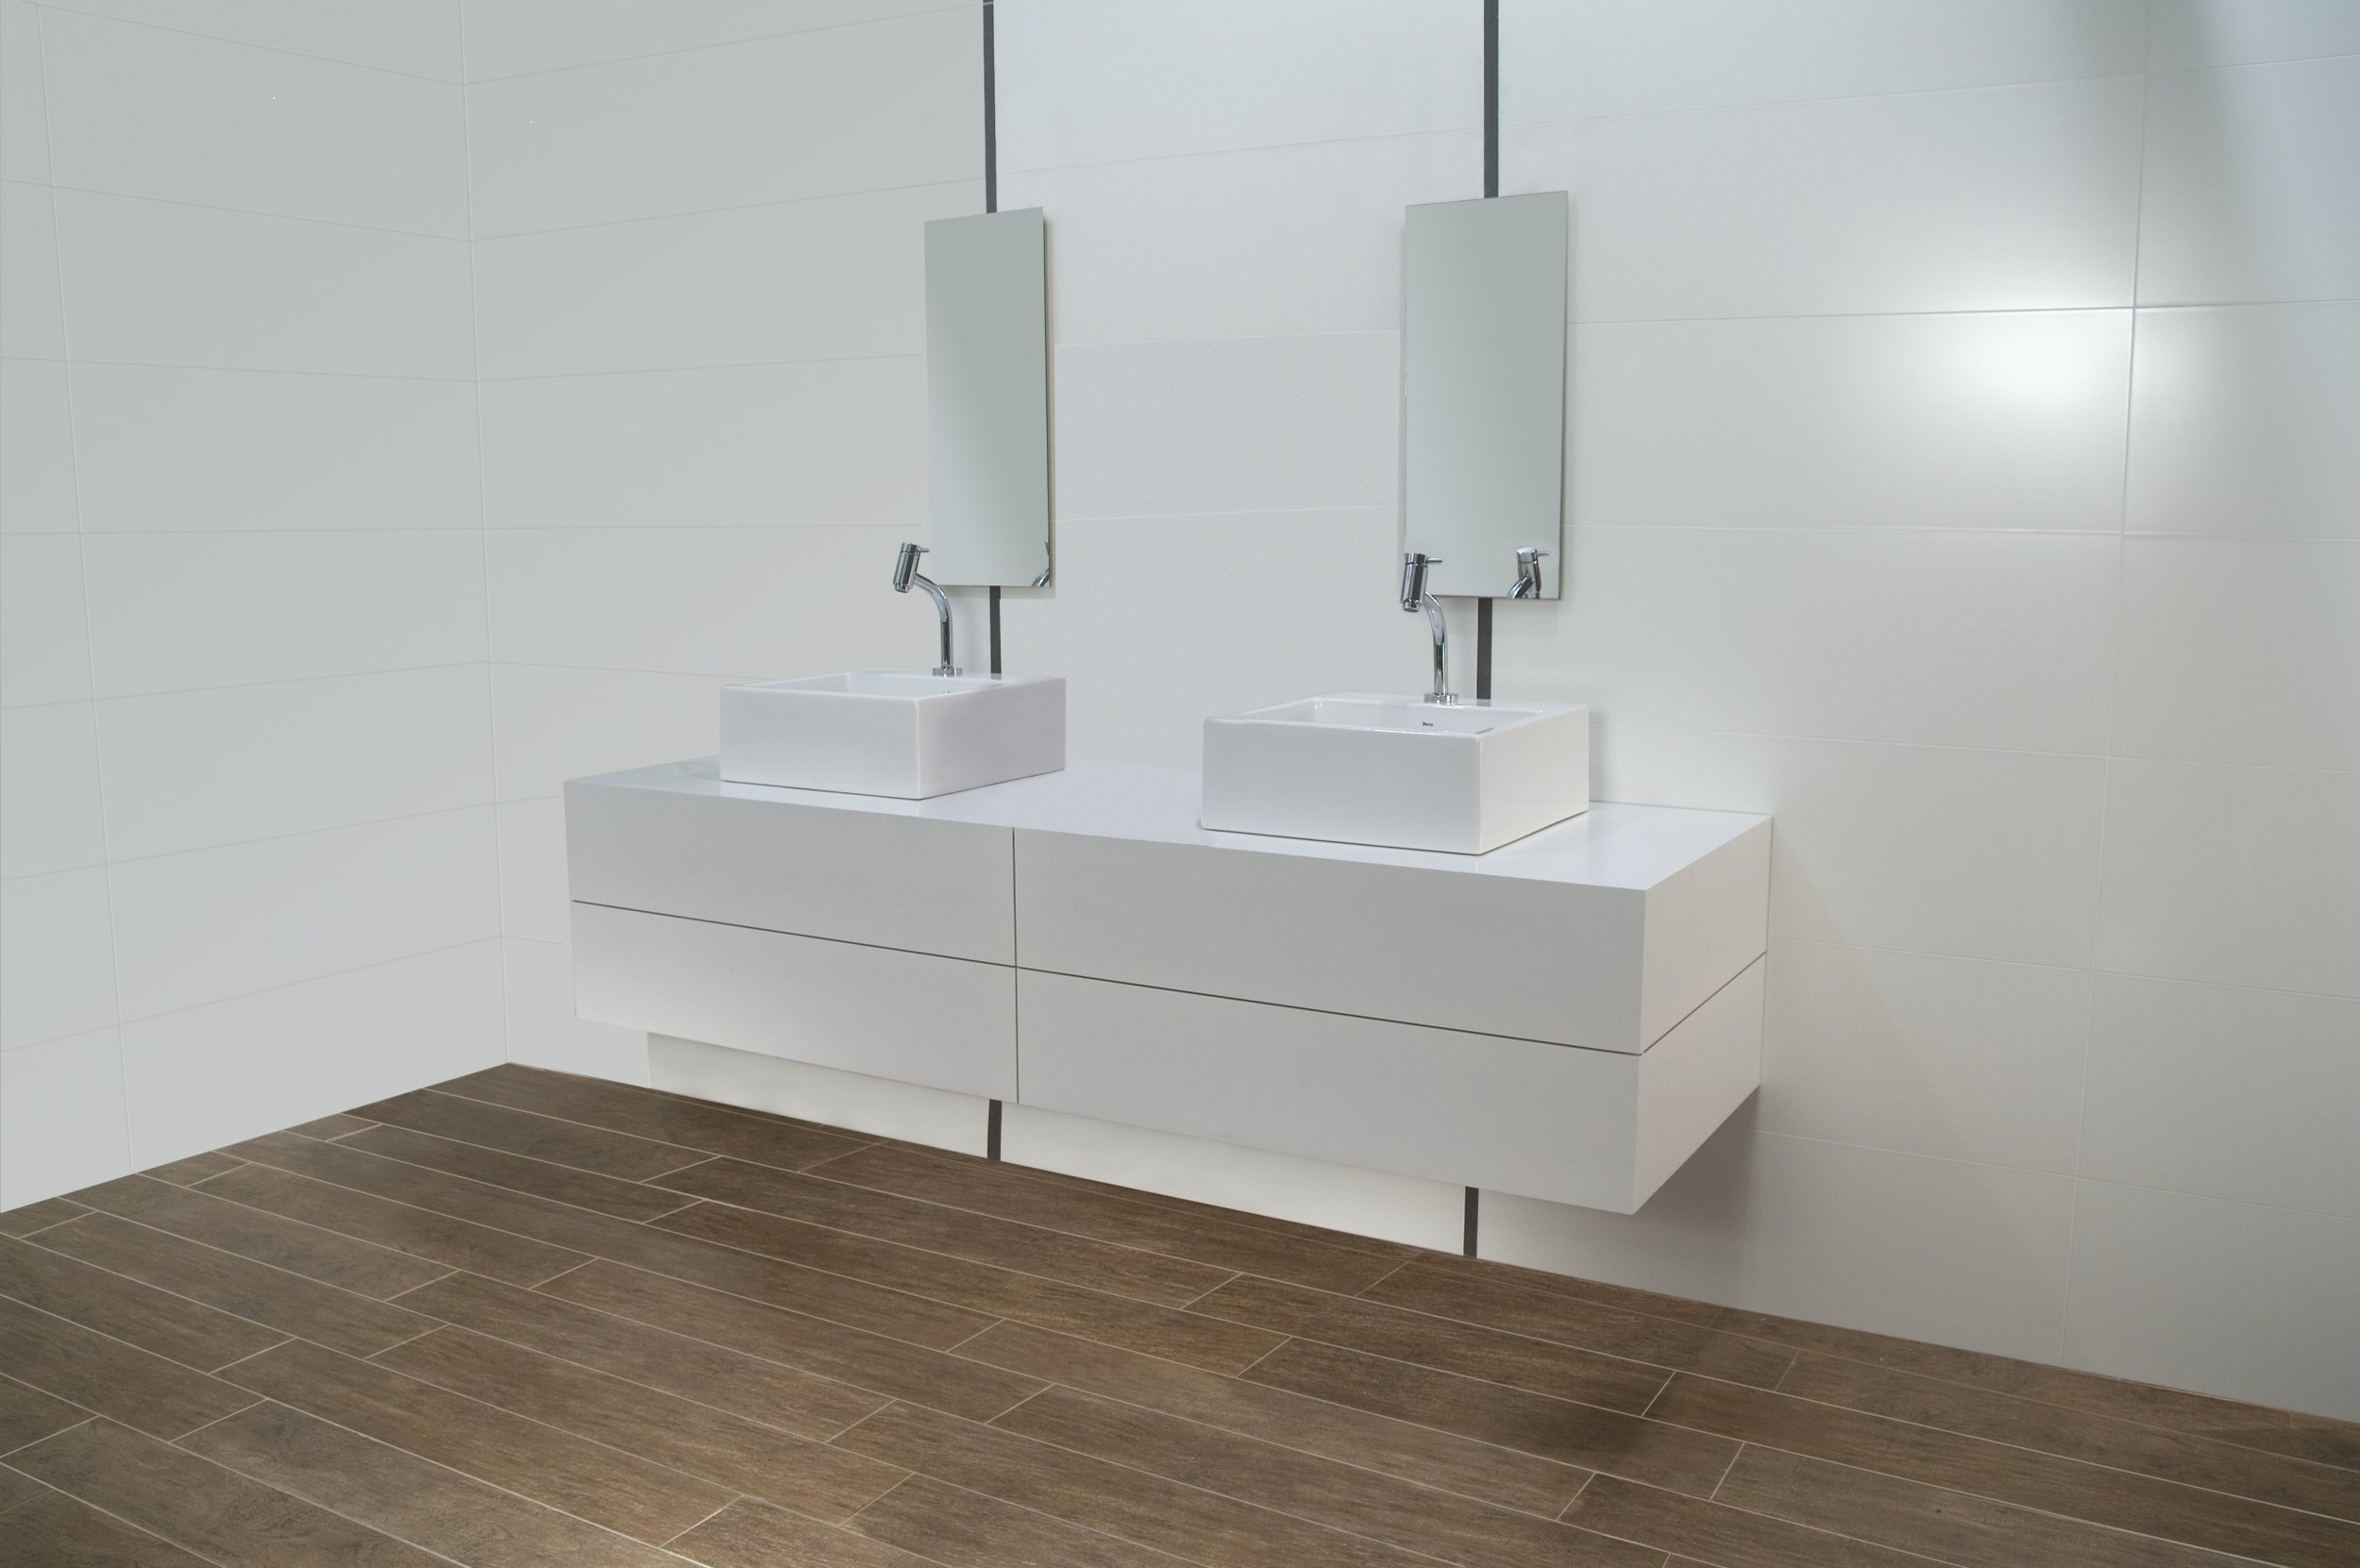 Cetim-Blanco-Room-Scene-2.jpg